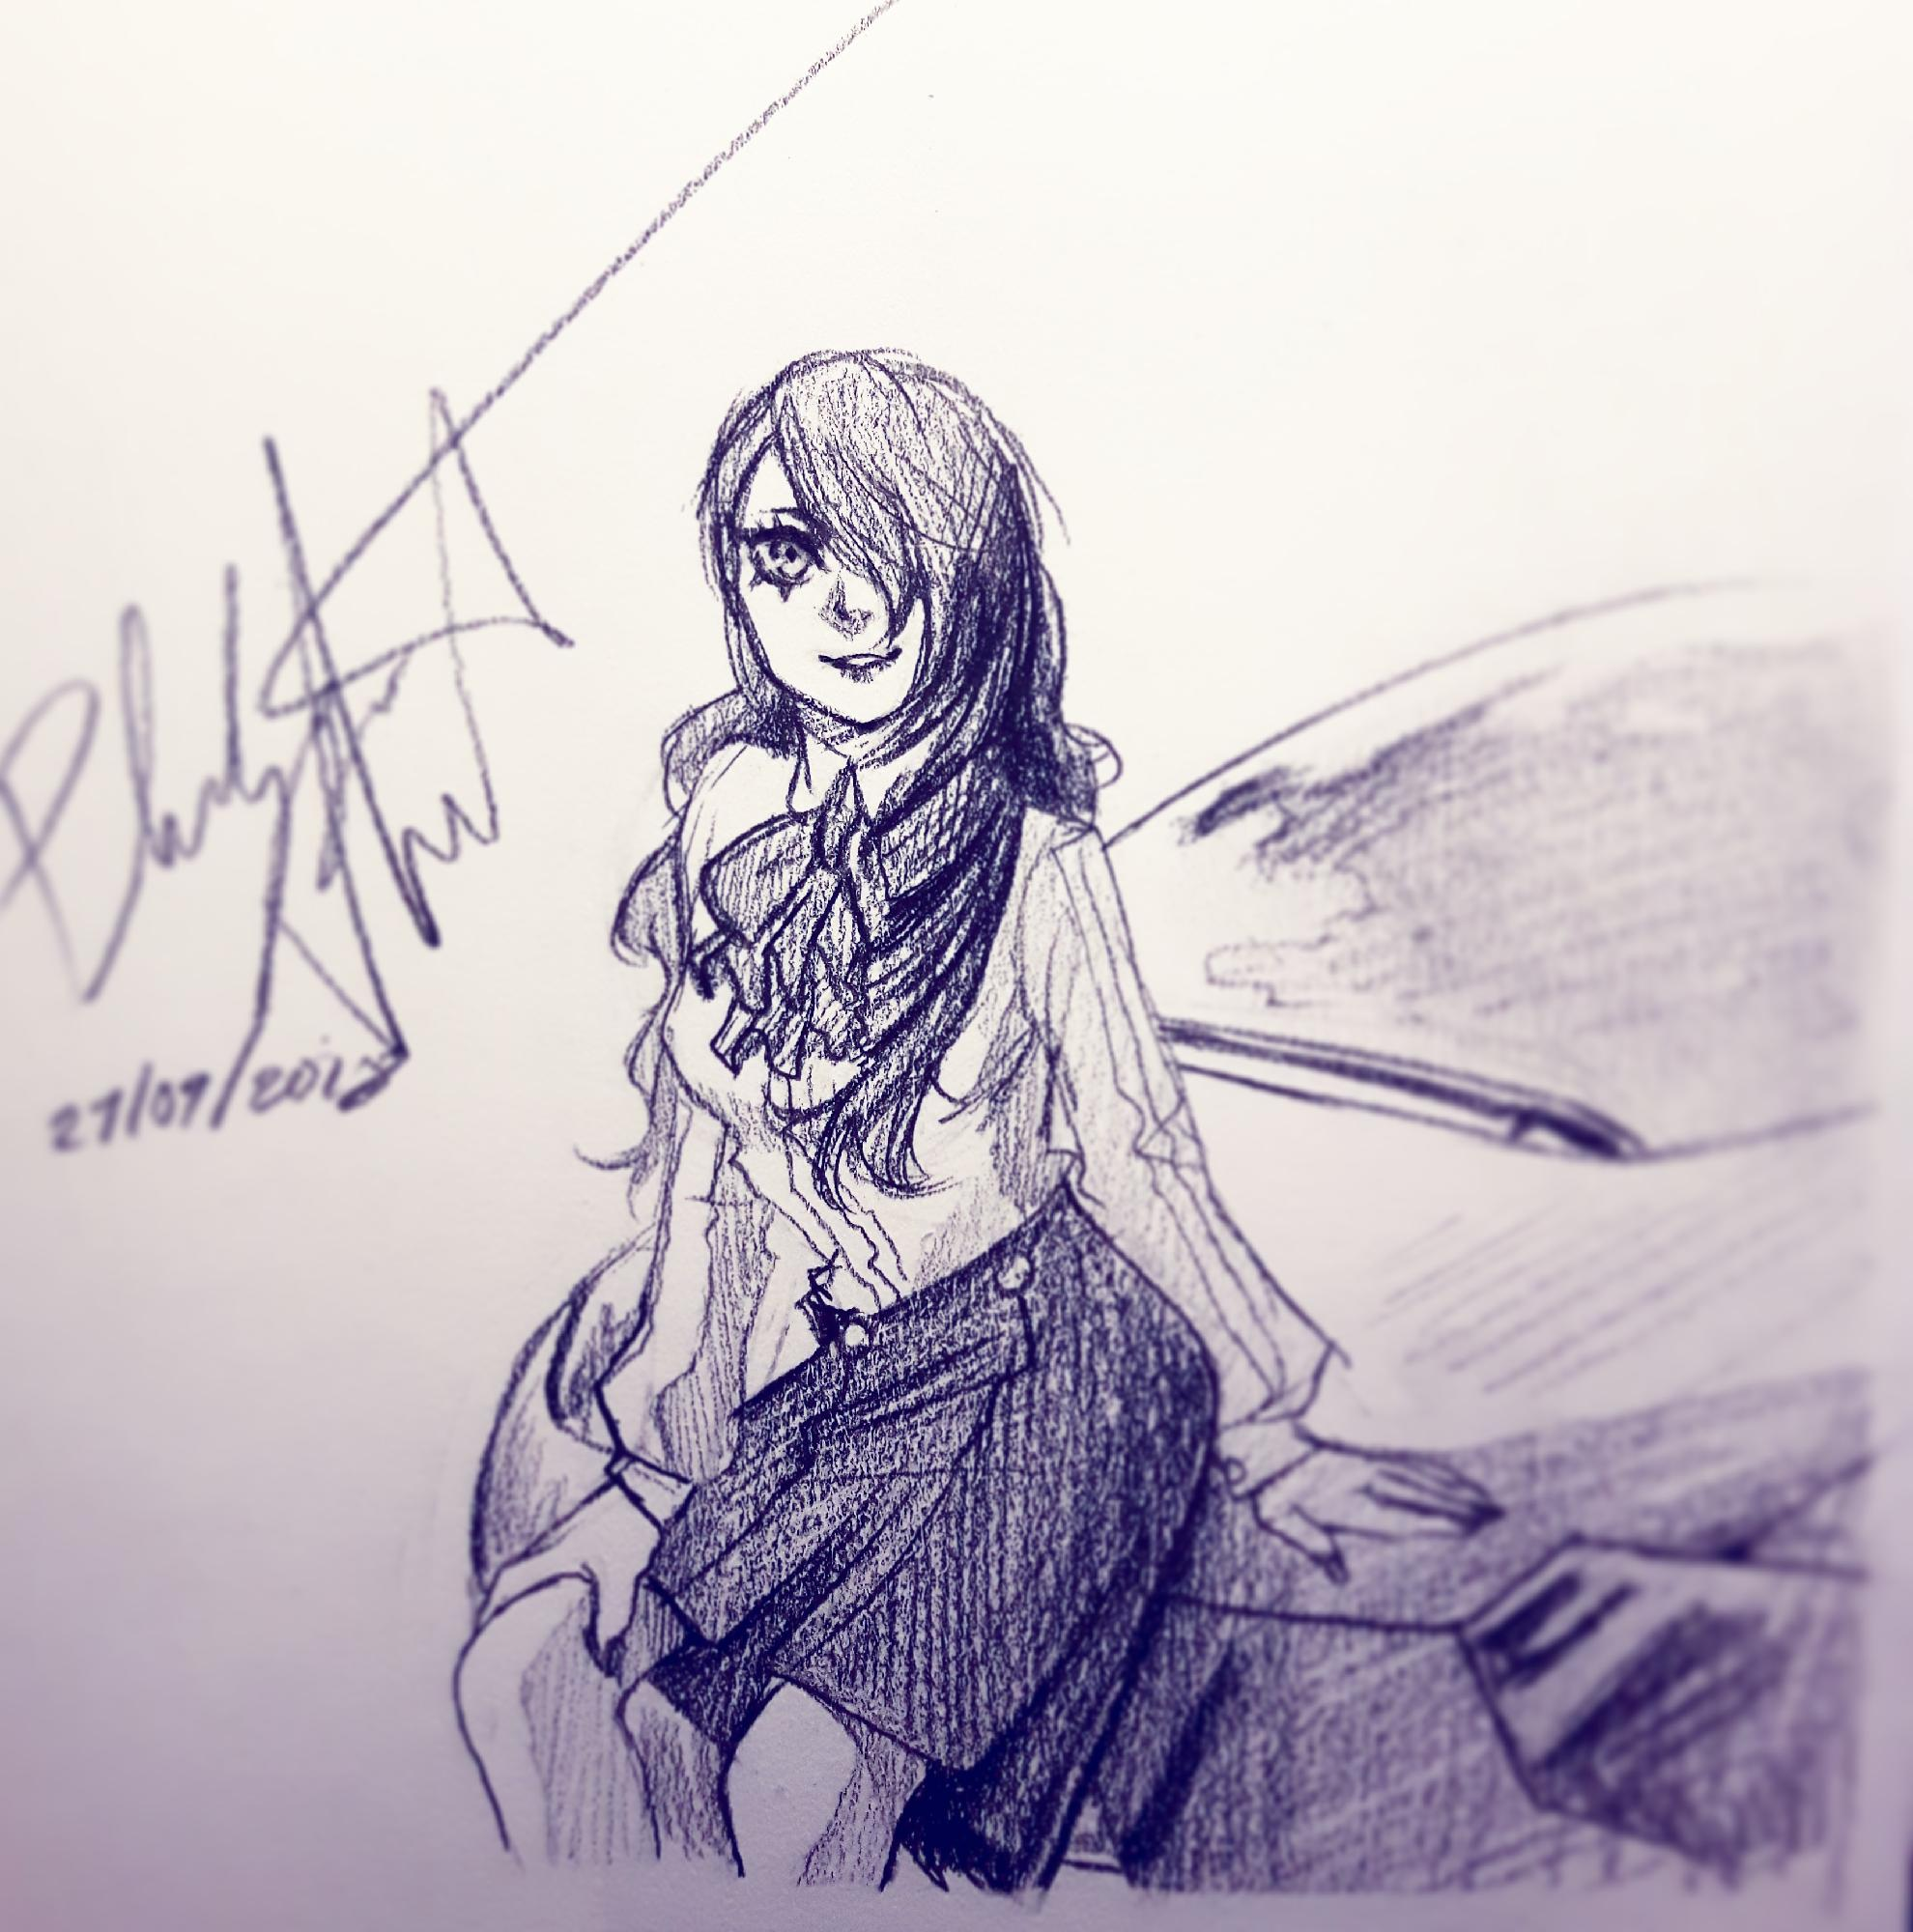 Sketch of Mitsuru from P3